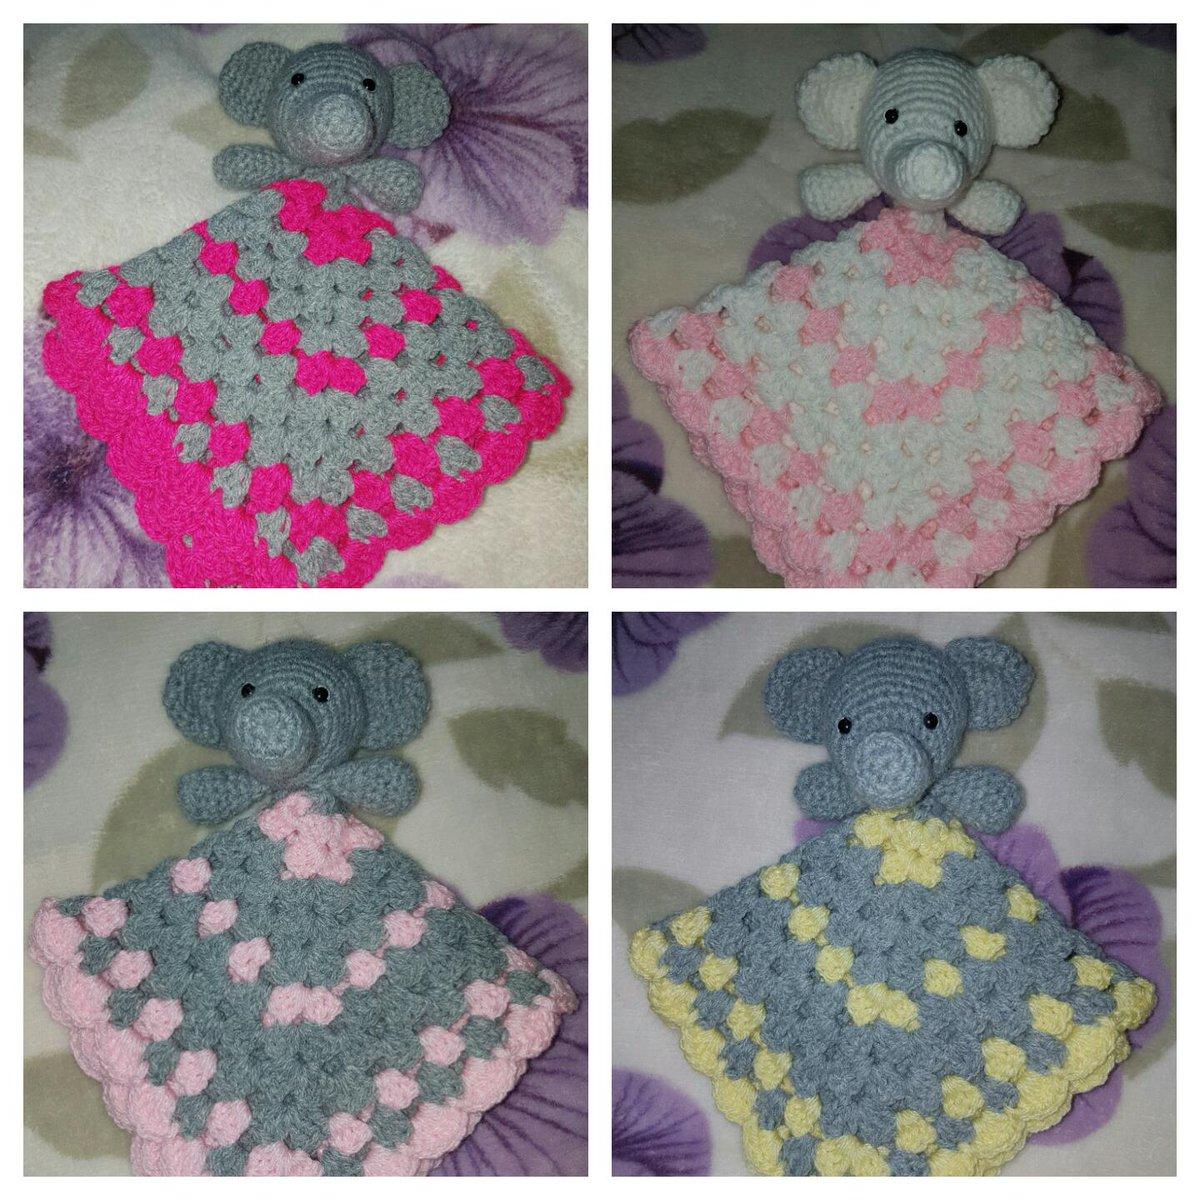 Grace: Crochet Elephant Comfort Blanket   1200x1200